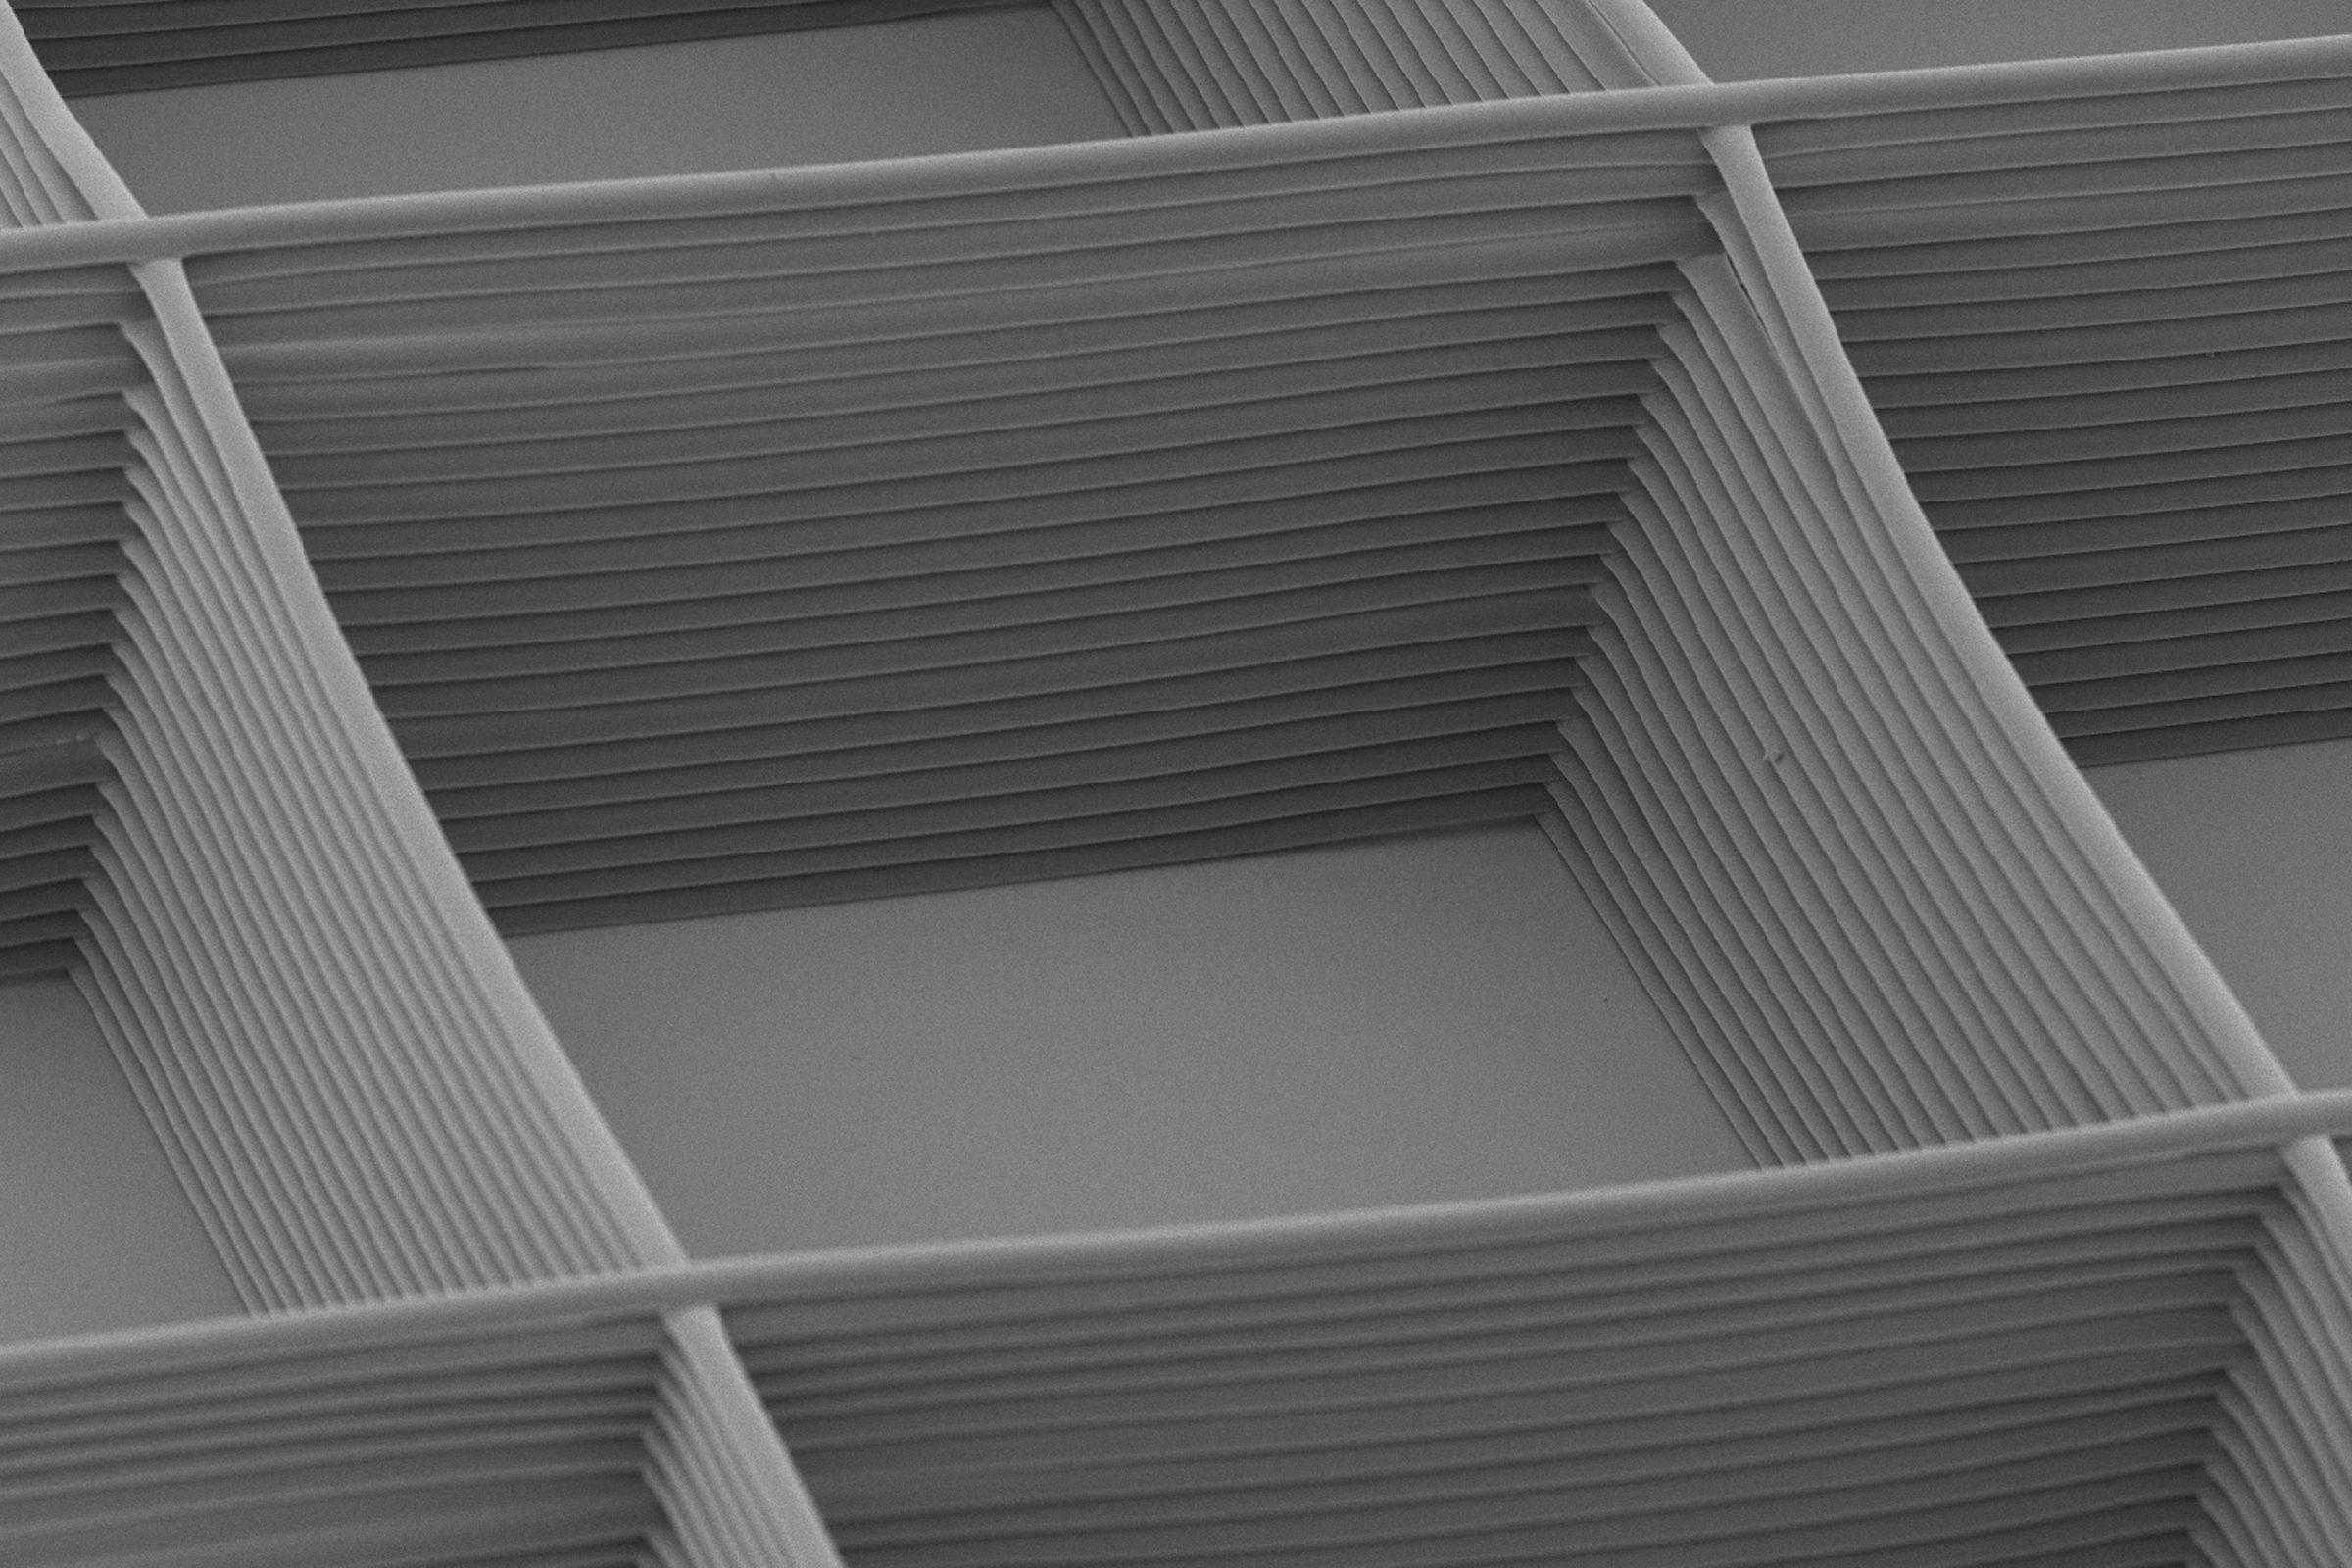 A 3D grid